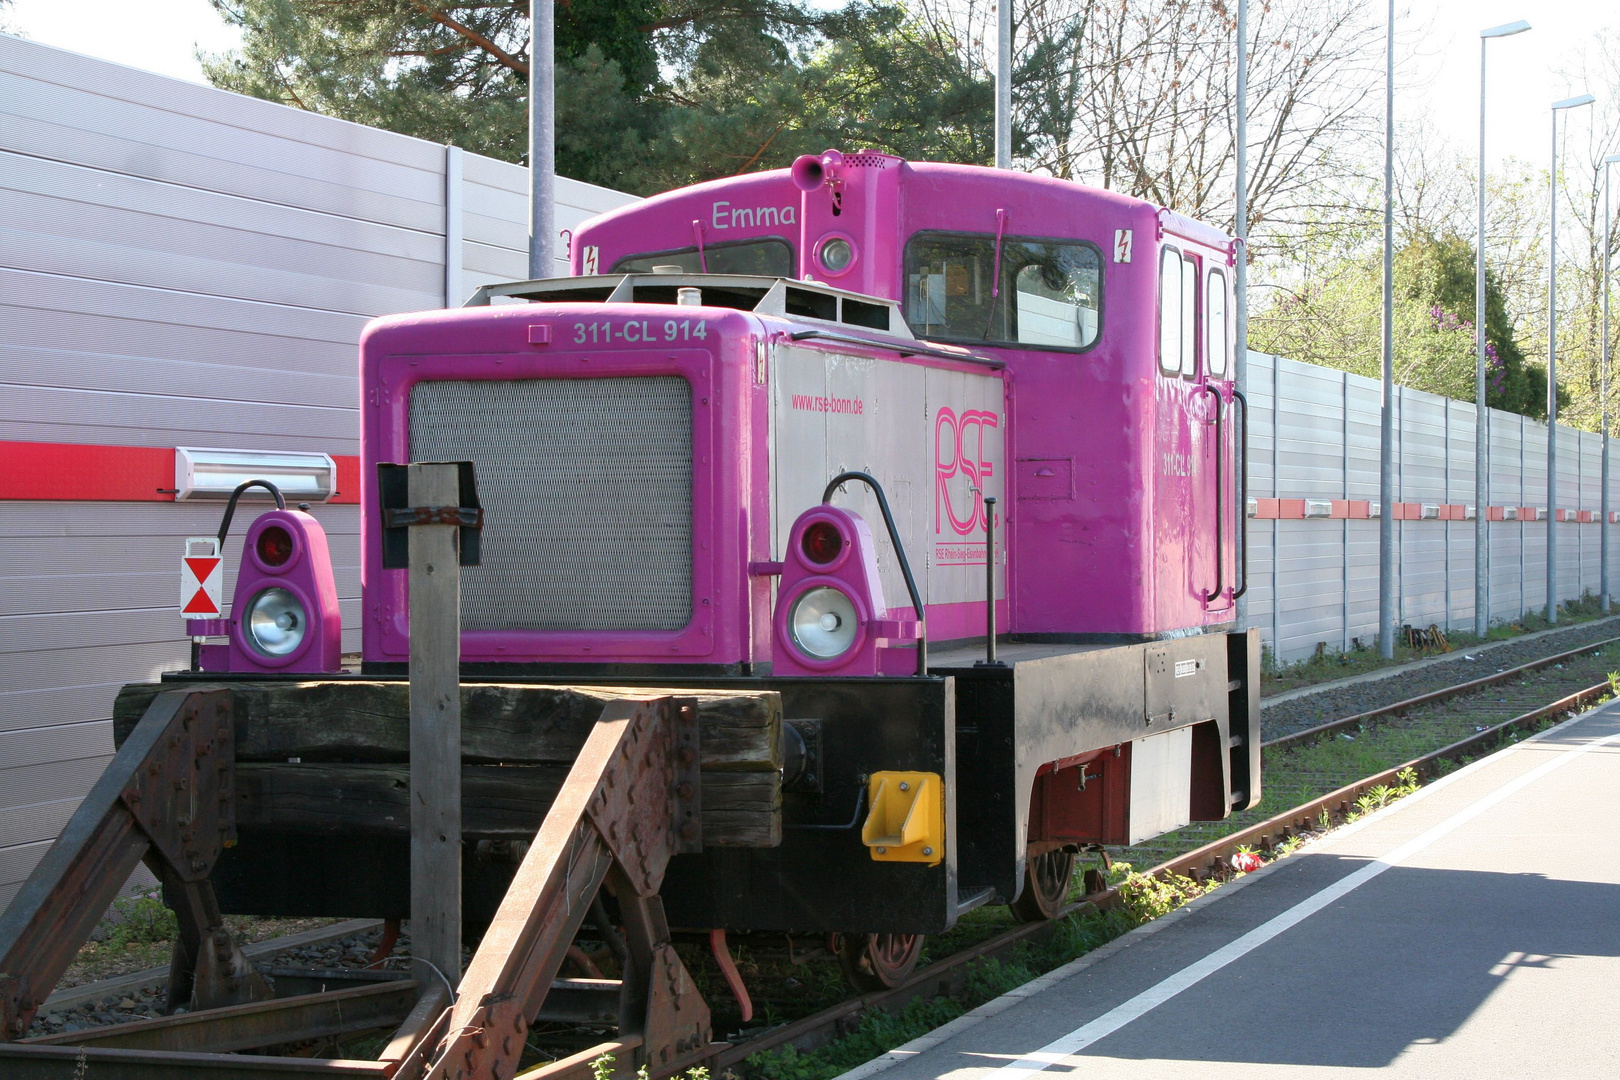 311 - CL 914